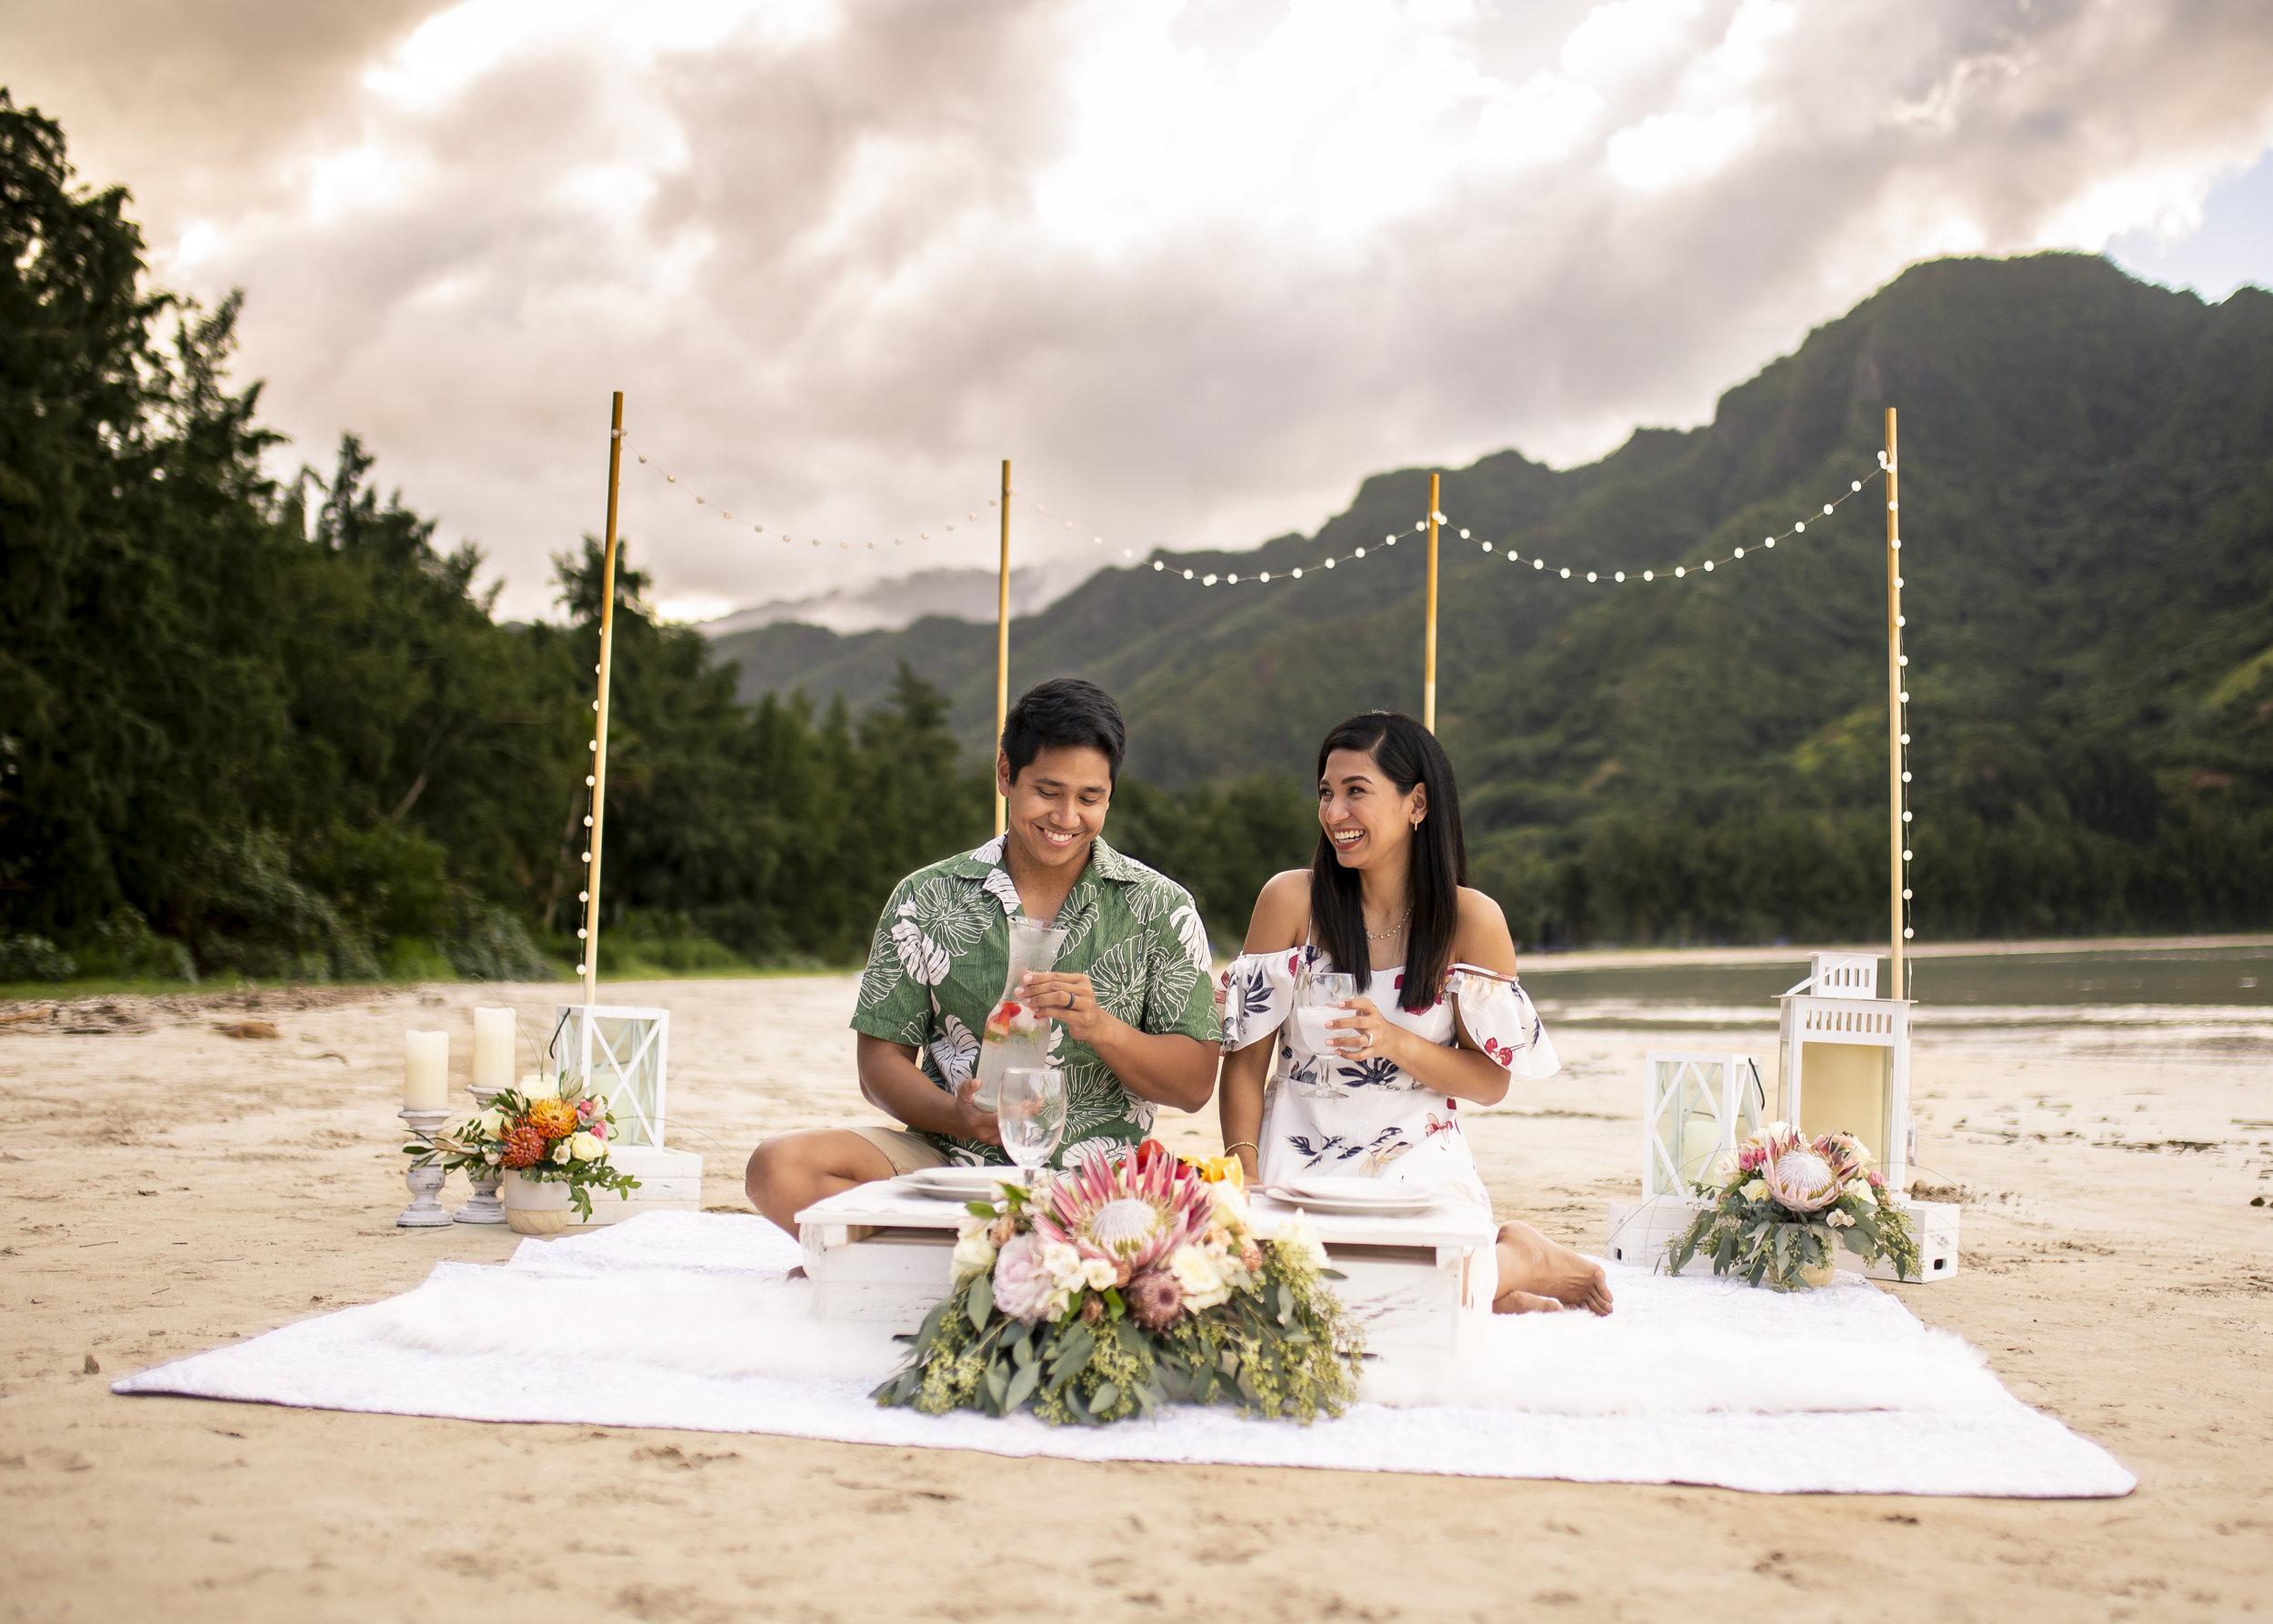 signed by roxci aloha picnics.jpg